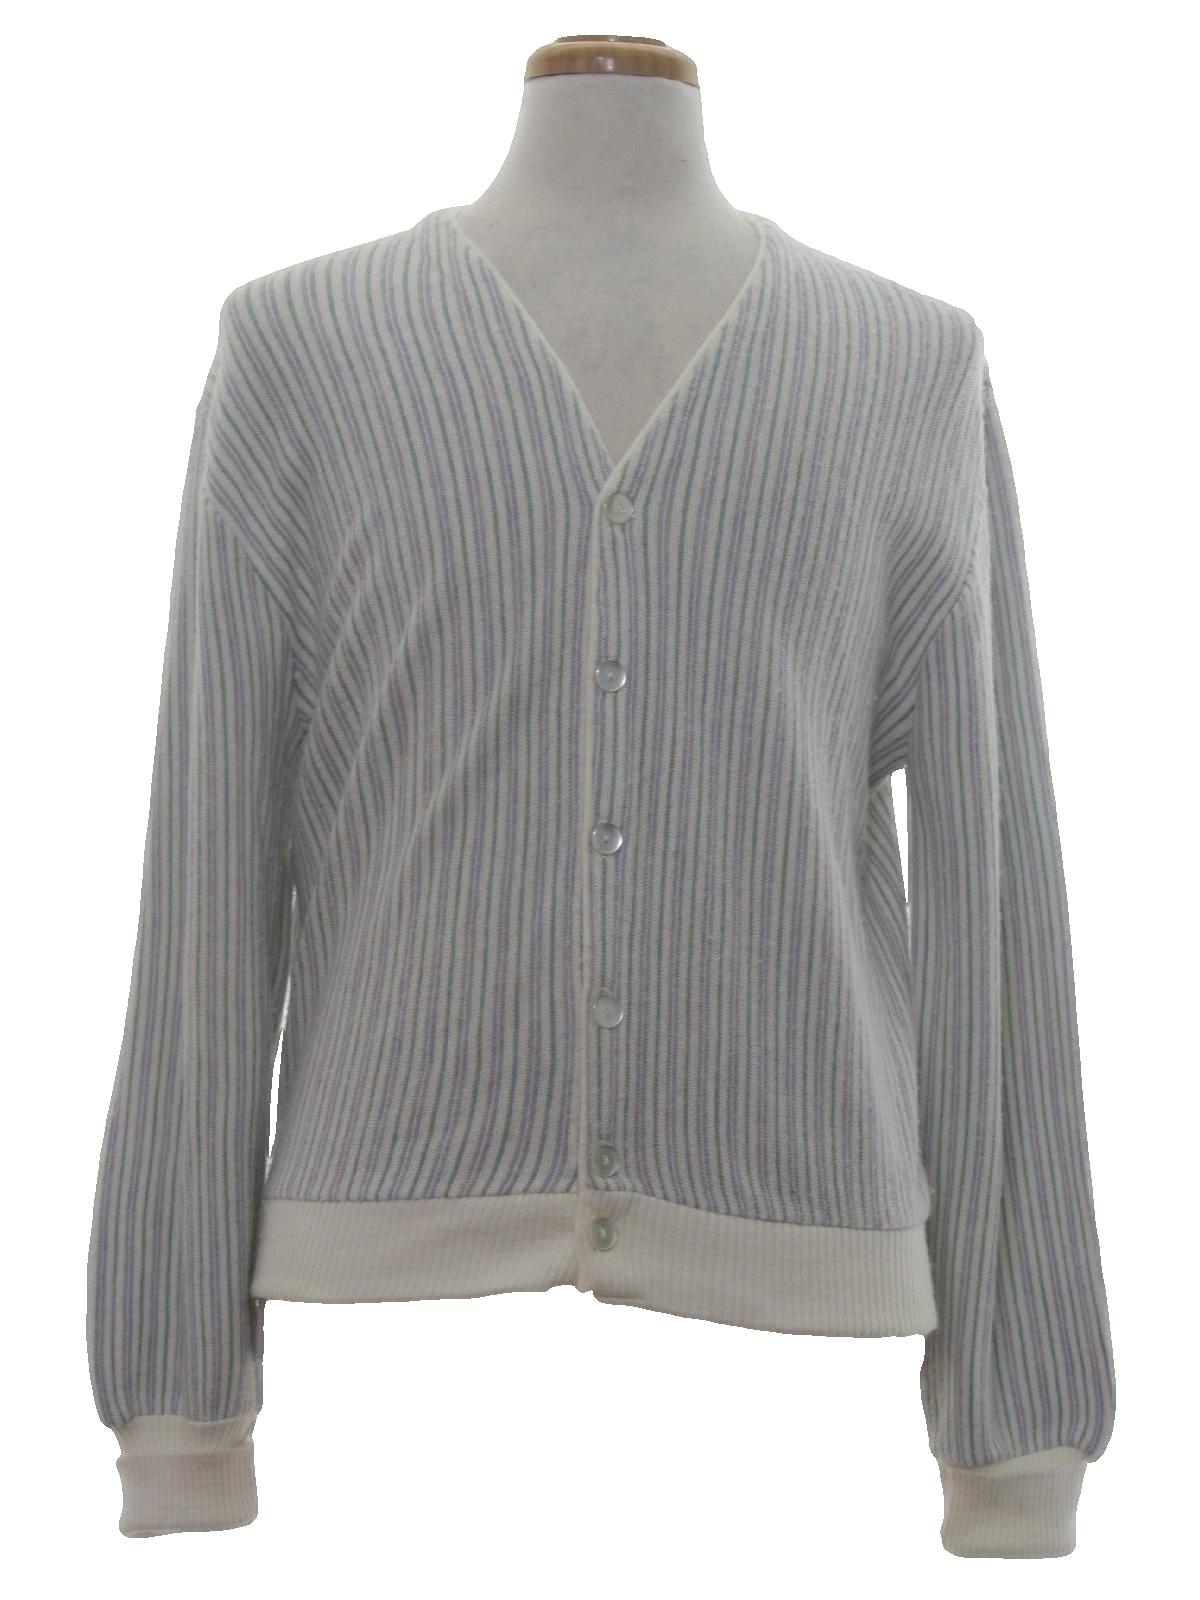 1970's Arnold Palmer Mens Cardigan Sweater